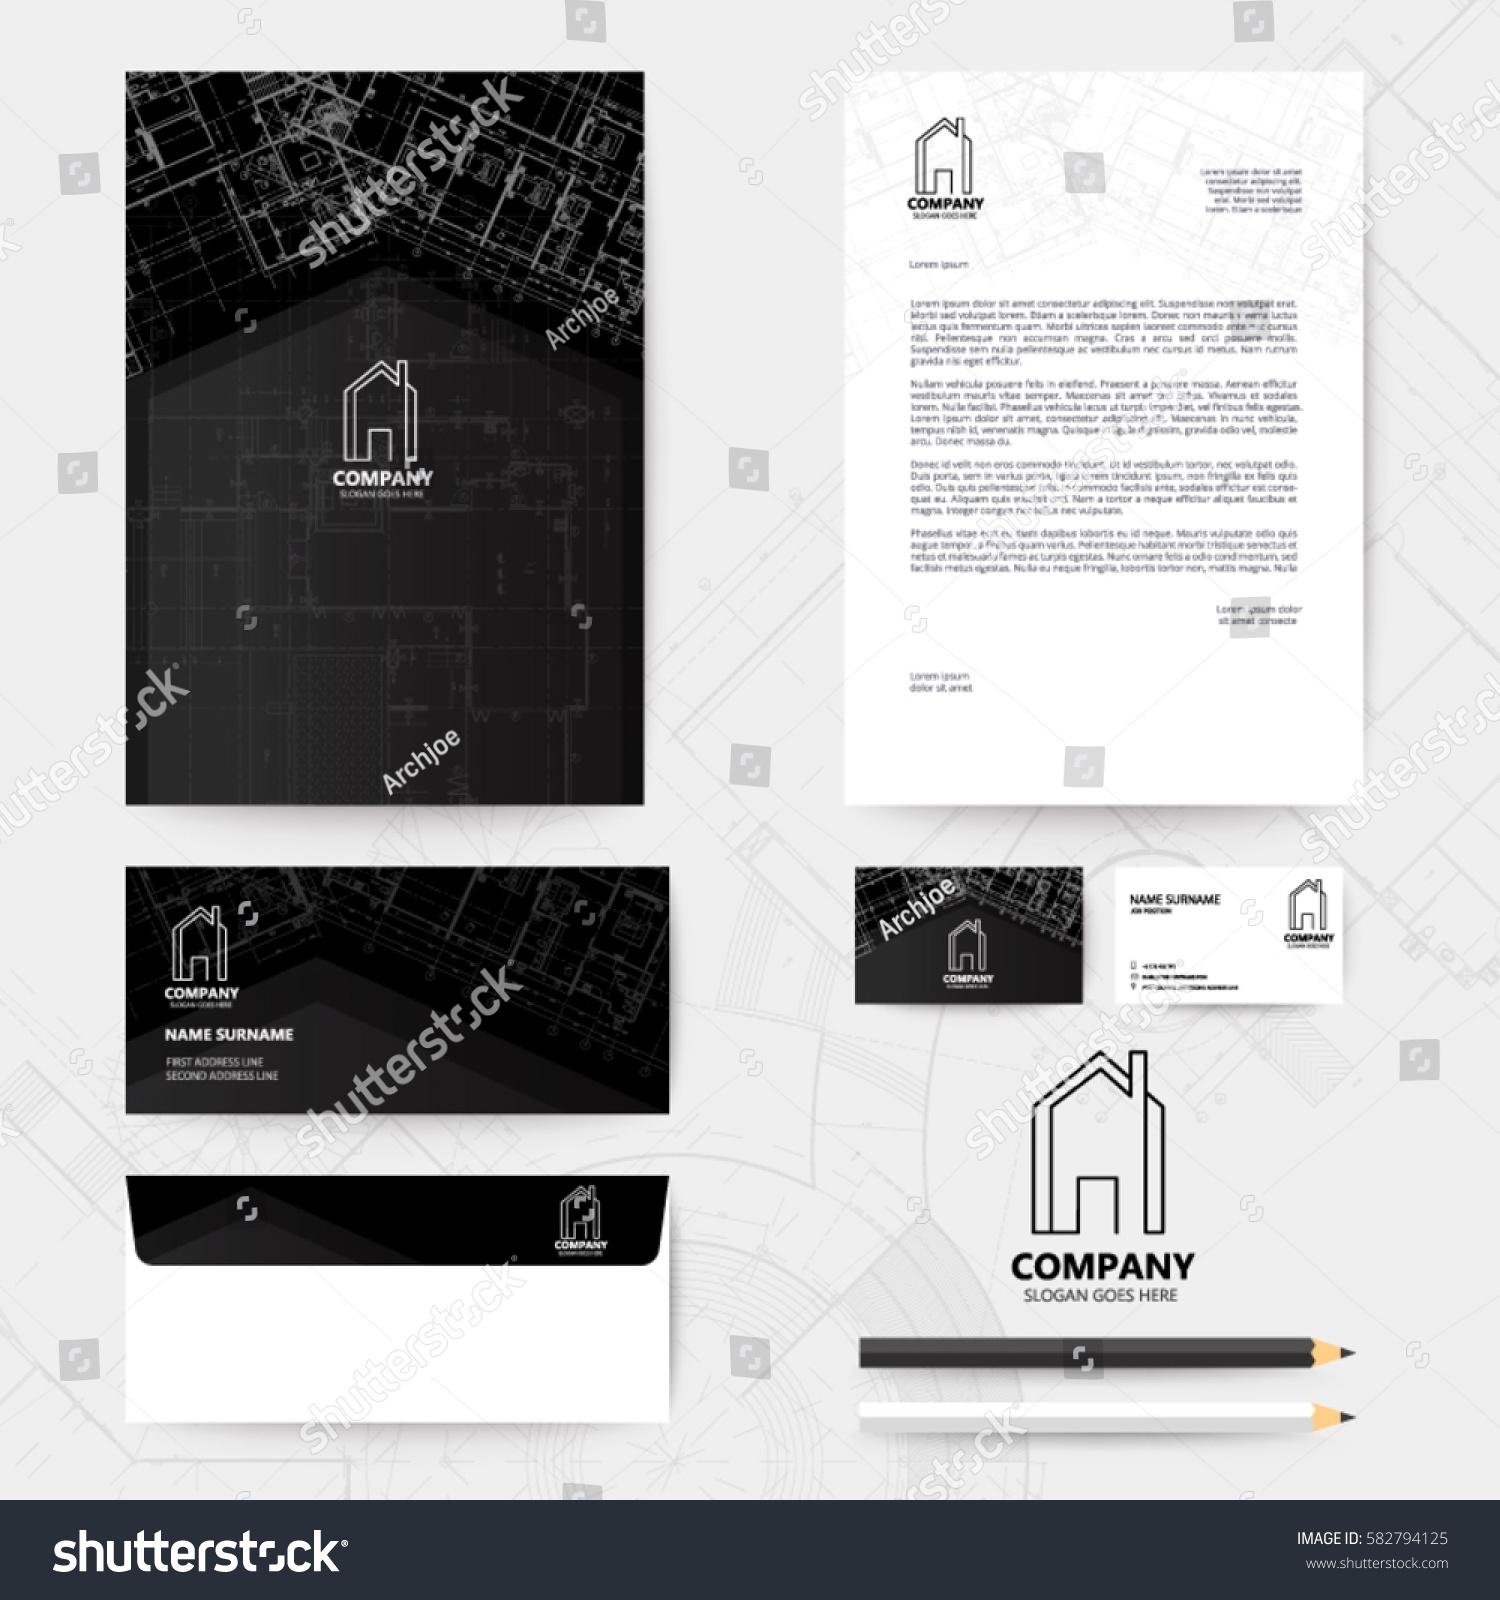 Corporate identity template design blueprint background stock vector corporate identity template design with blueprint background business realestate wajeb Images